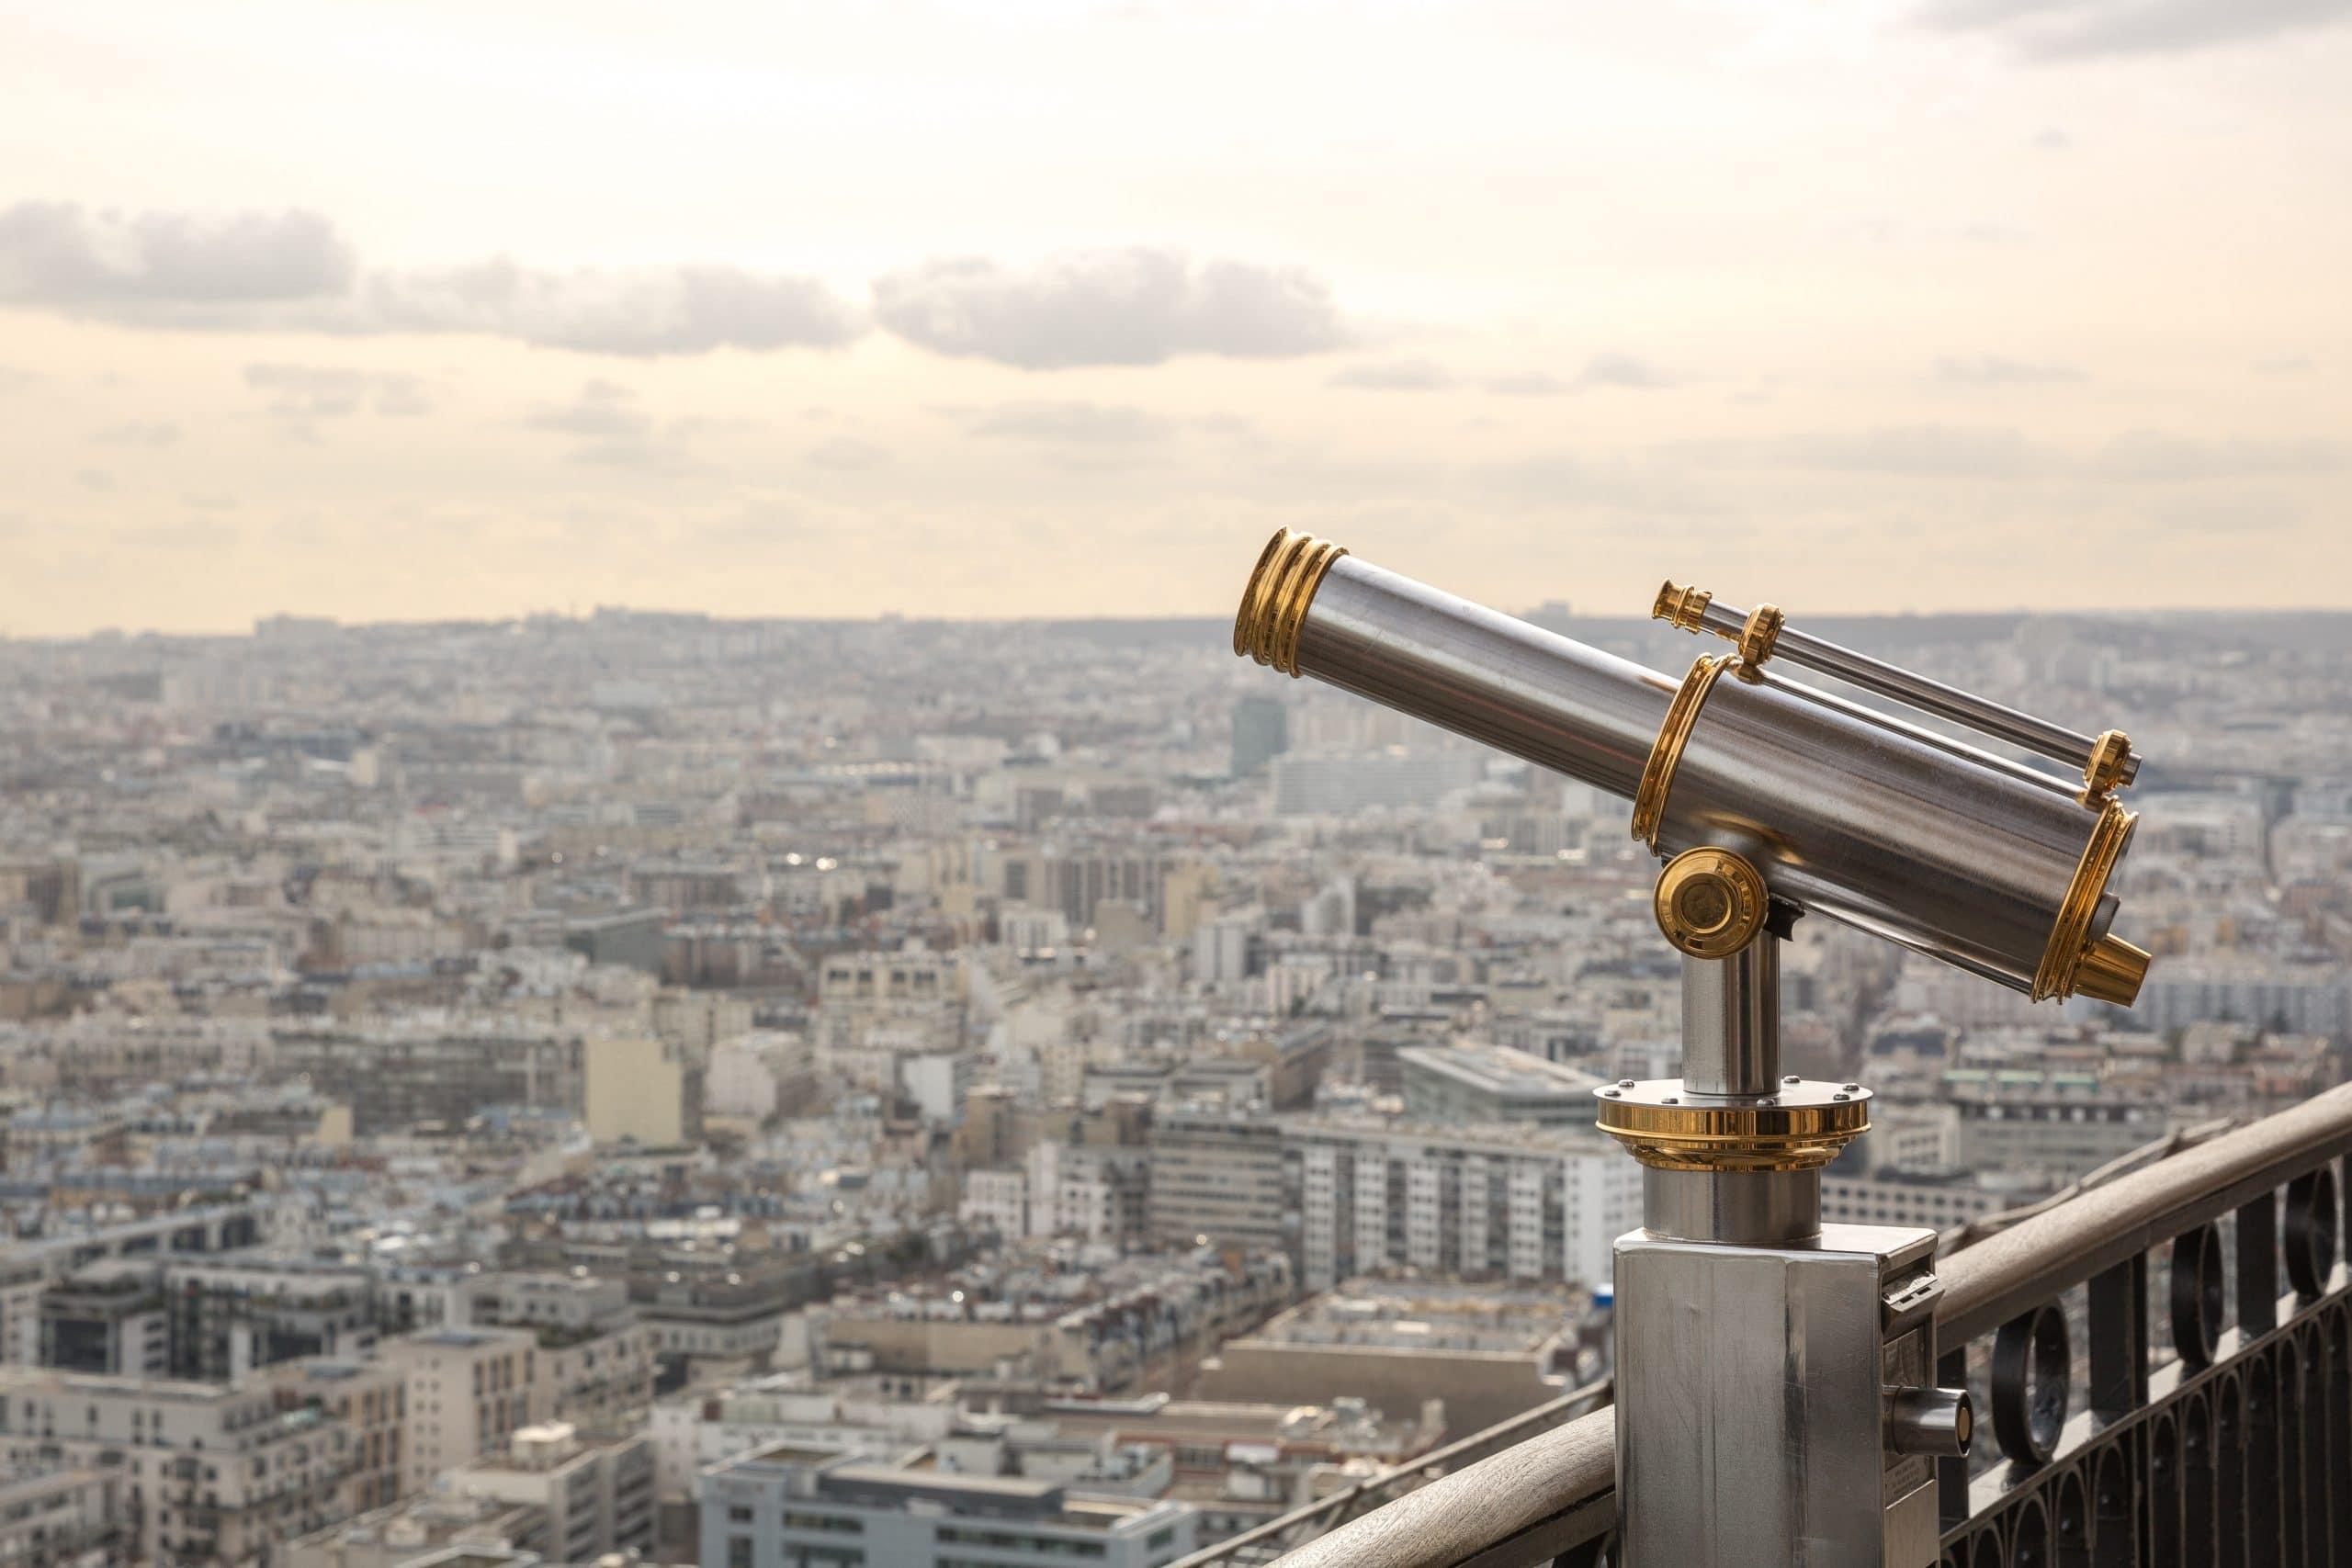 A telescope on a balcony above a cityscape